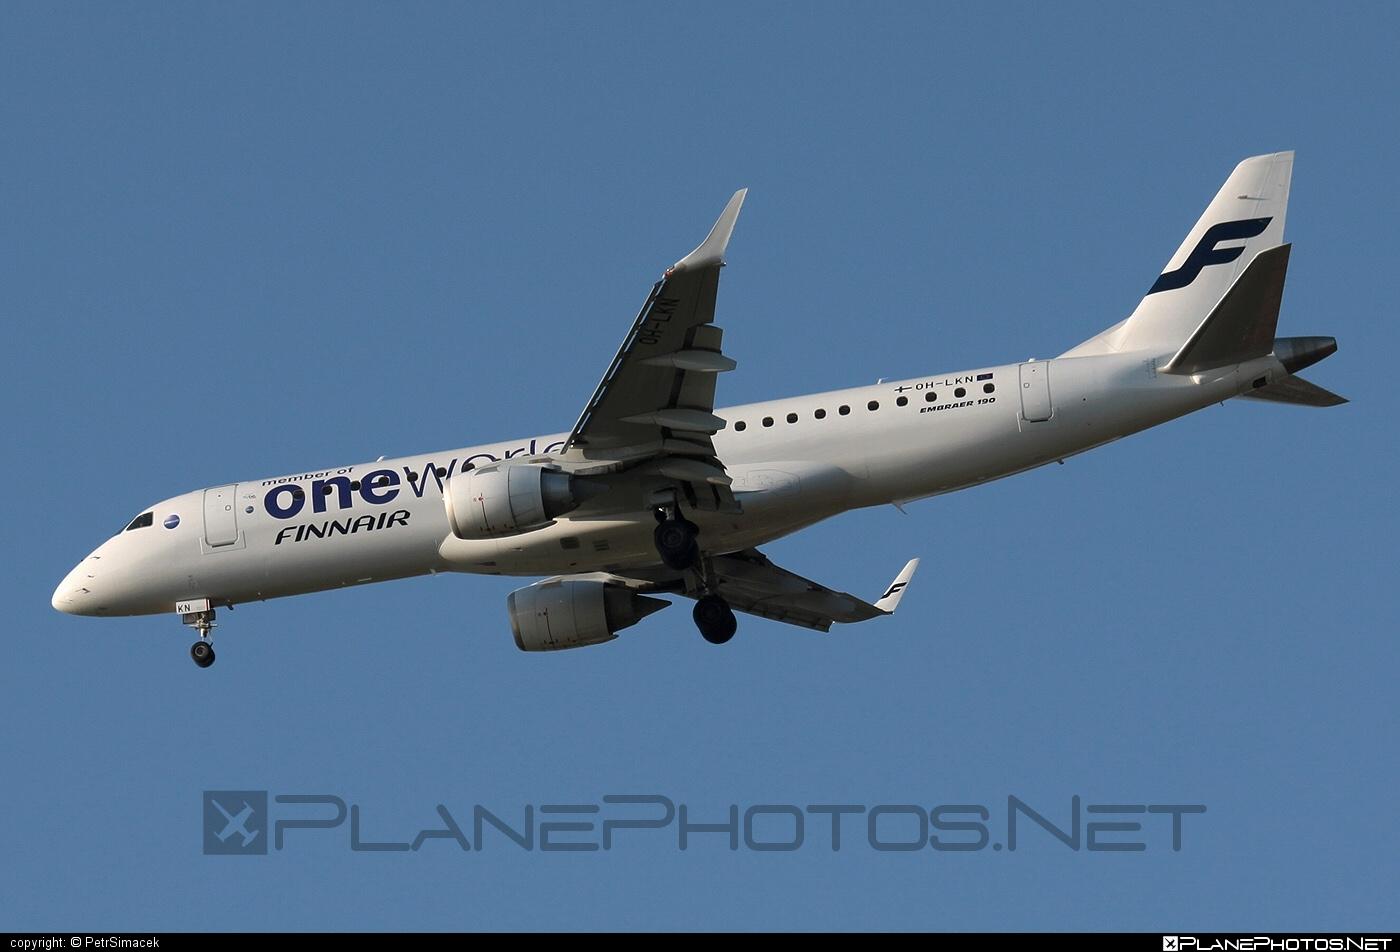 Embraer E190LR (ERJ-190-100LR) - OH-LKN operated by Finnair #e190 #e190100 #e190100lr #e190lr #embraer #embraer190 #embraer190100lr #embraer190lr #finnair #oneworld